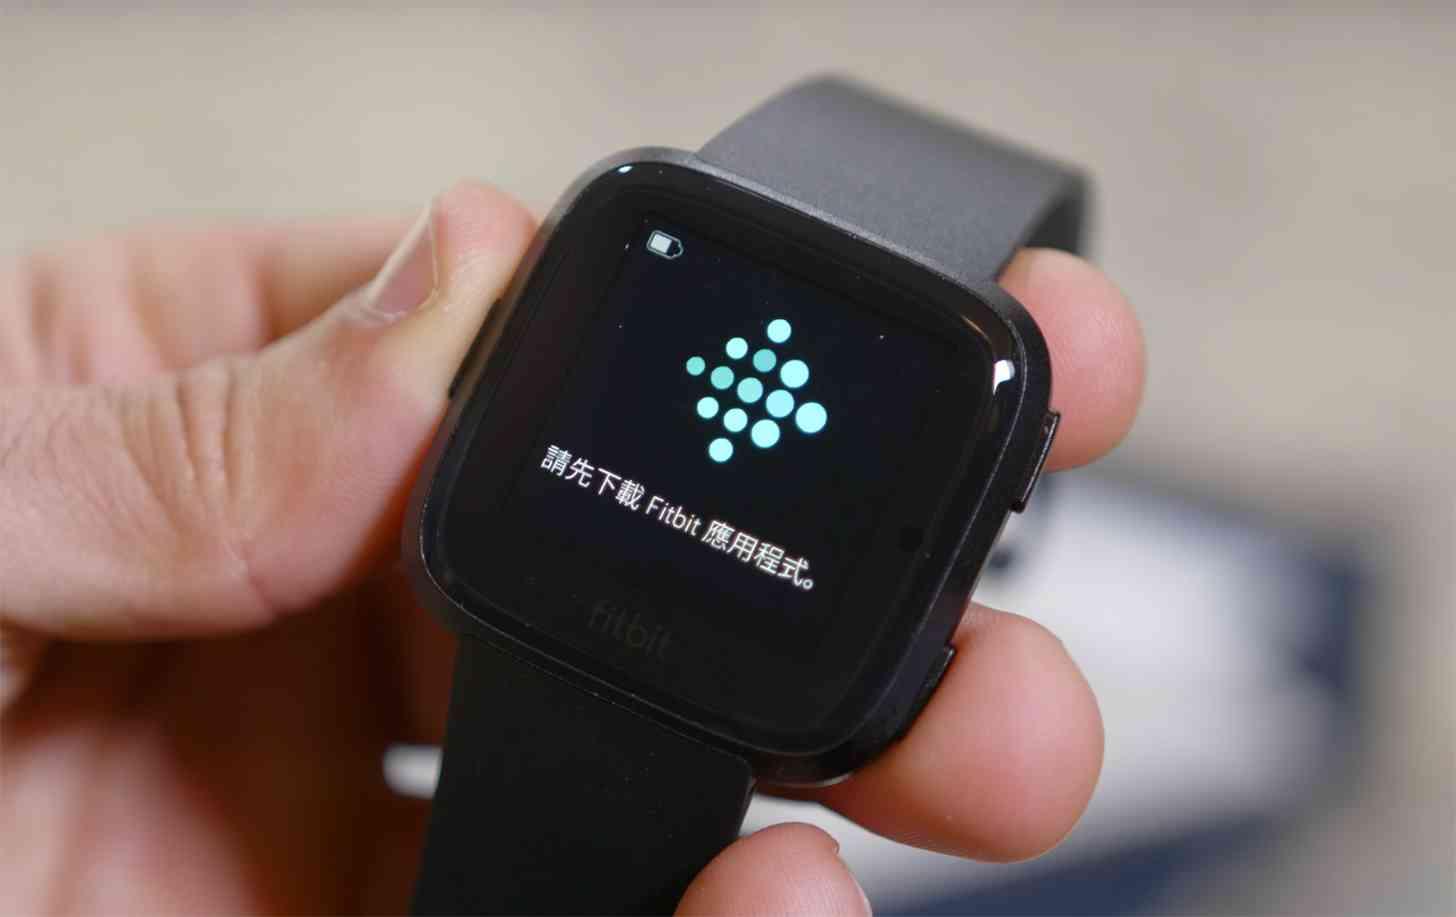 Fitbit Versa hands-on video